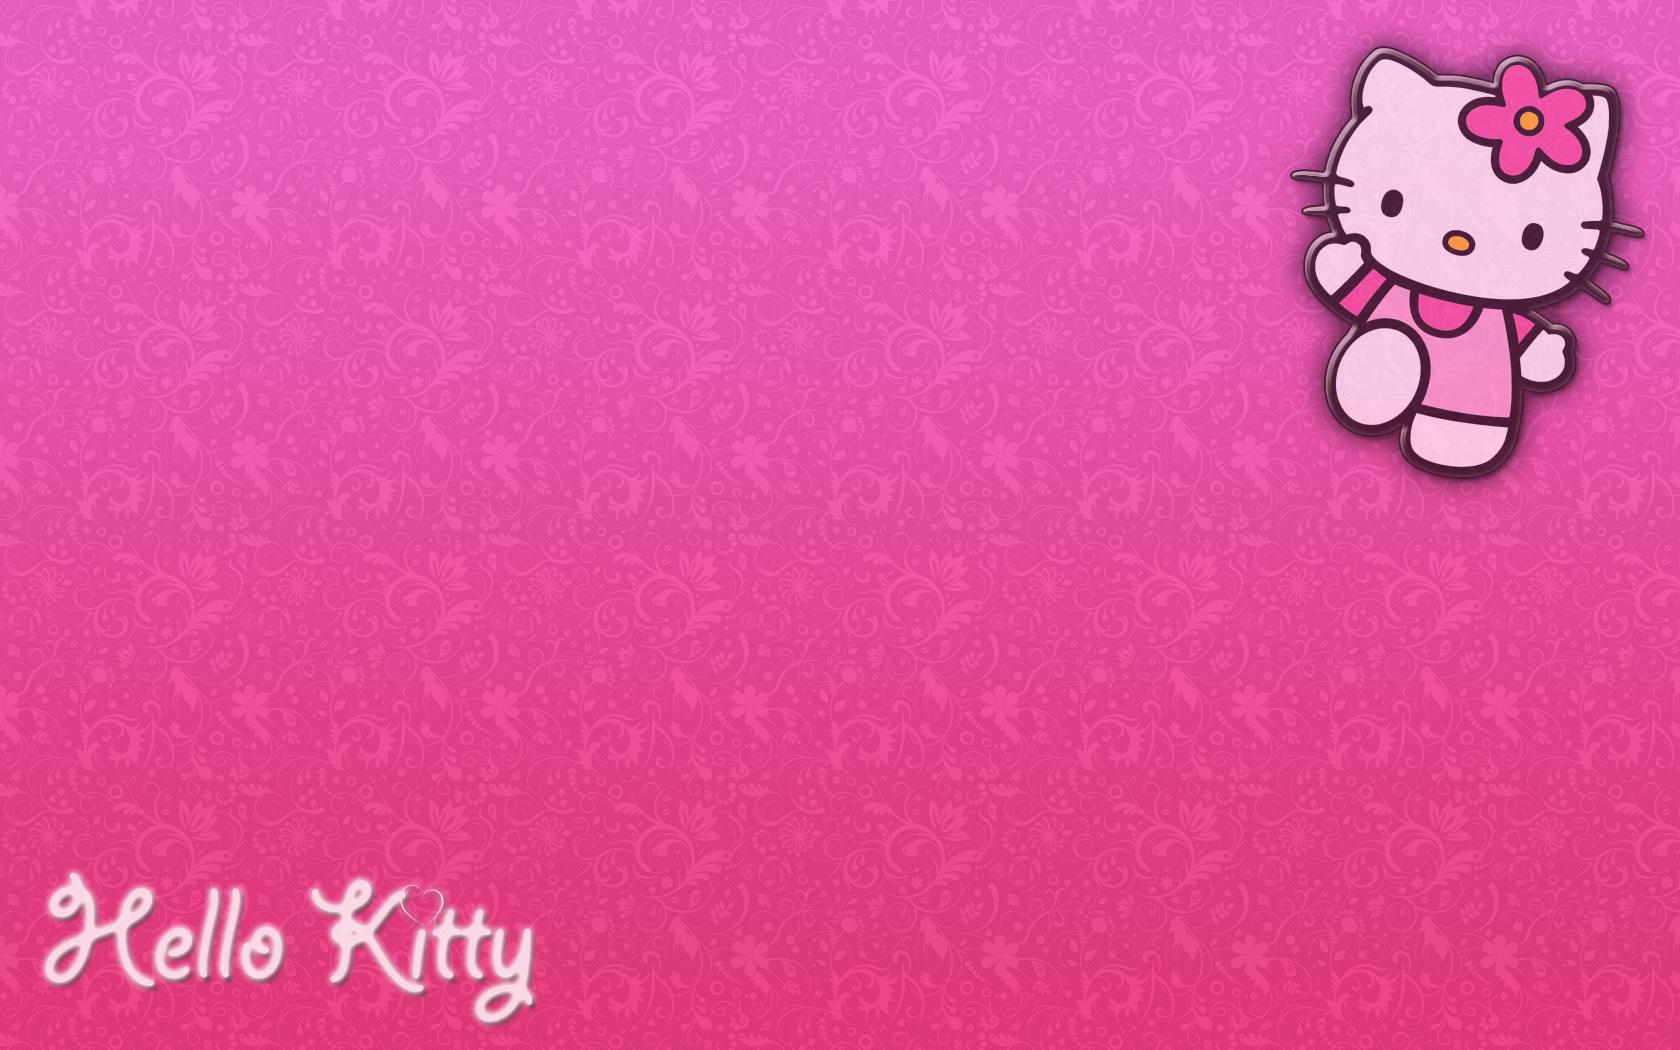 Hello Kitty Cute Backgrounds Wallpaper Wide For Desktop 1680x1050